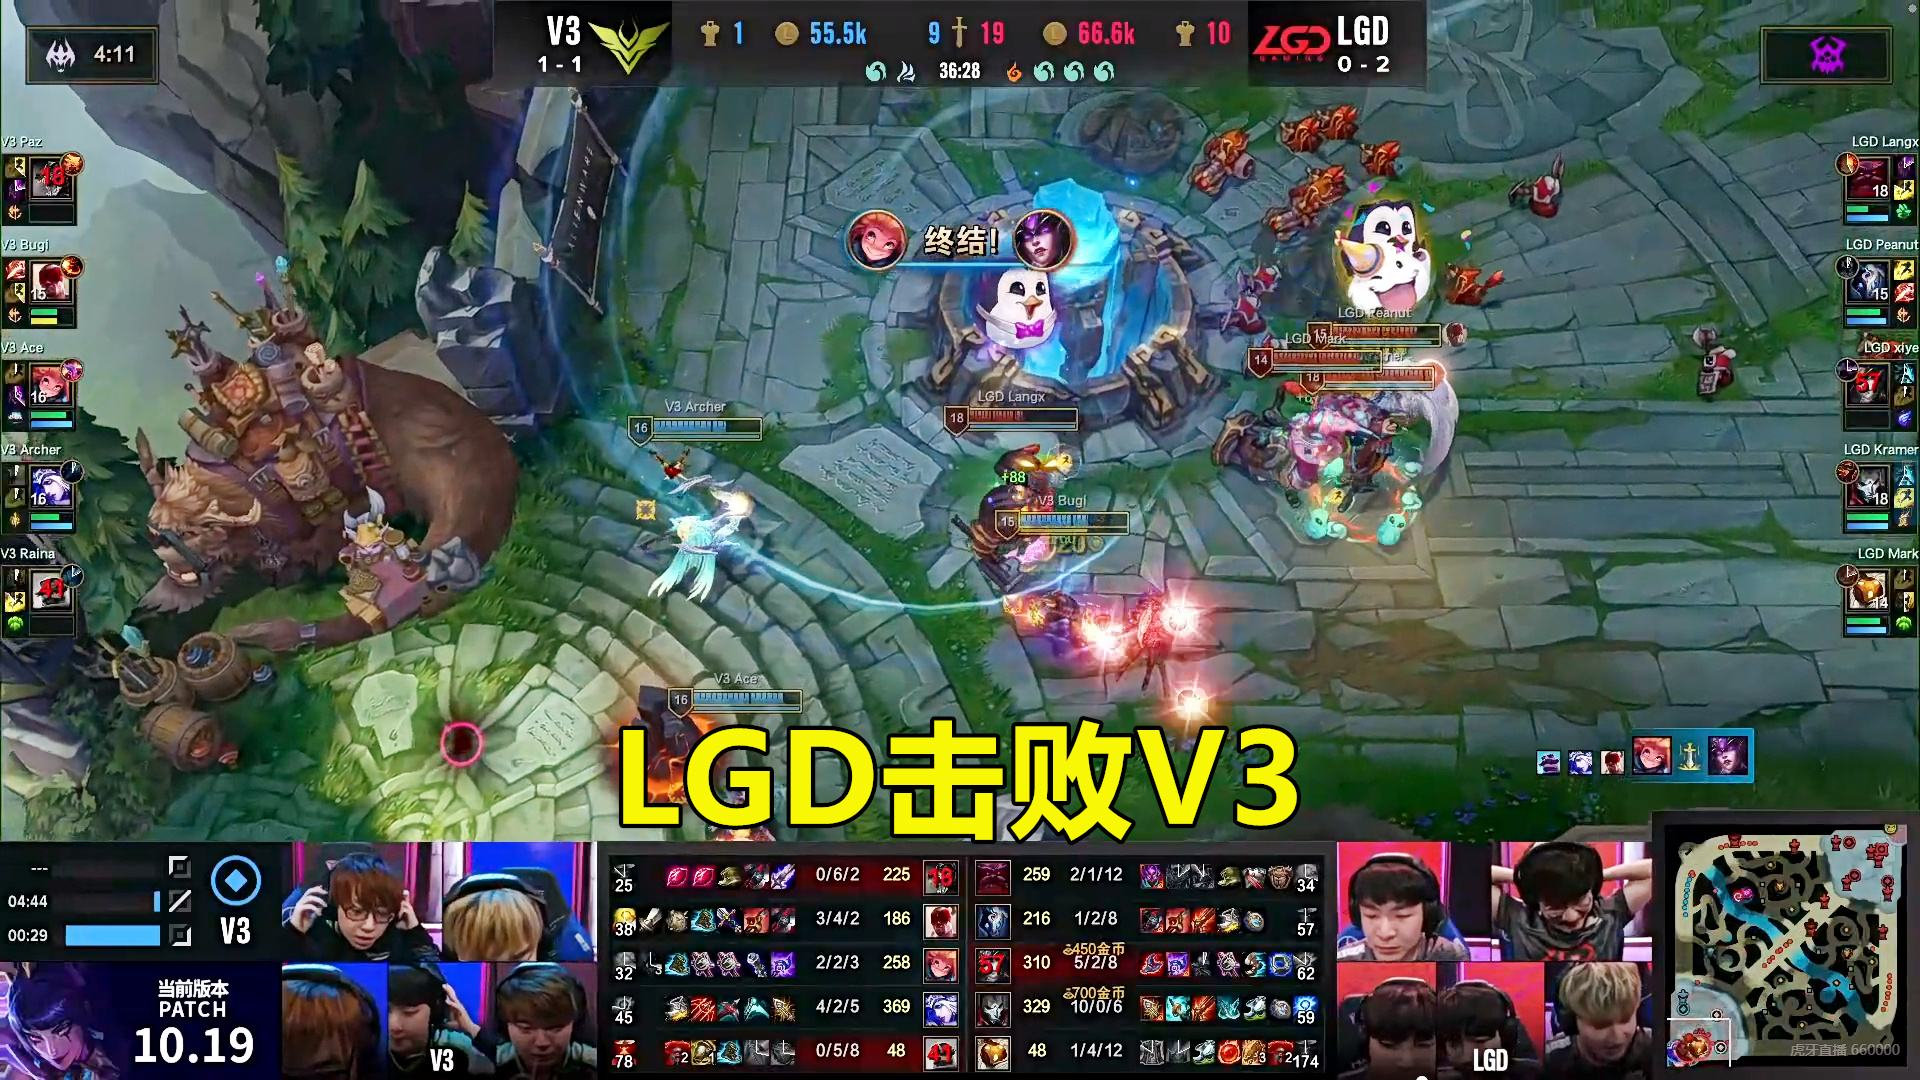 S10總決賽:LGD能否挺過小組賽?lpl風格和lck風格的再次較量-圖7